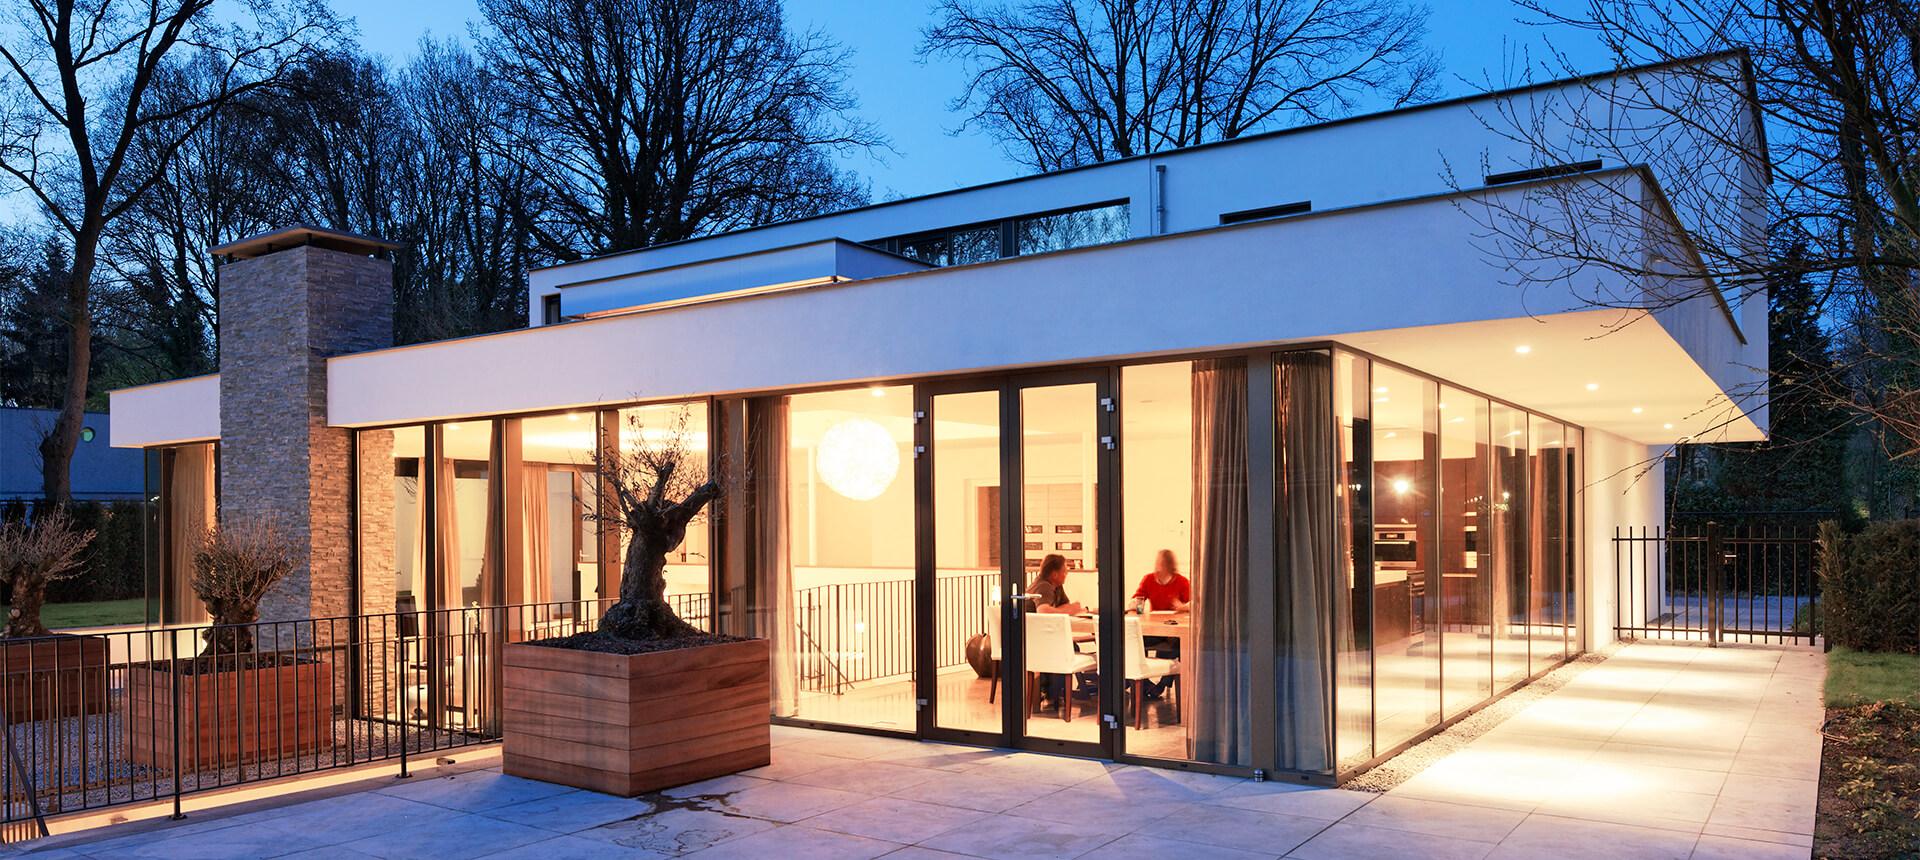 Villa houben van mierlo architecten for Houben interieur